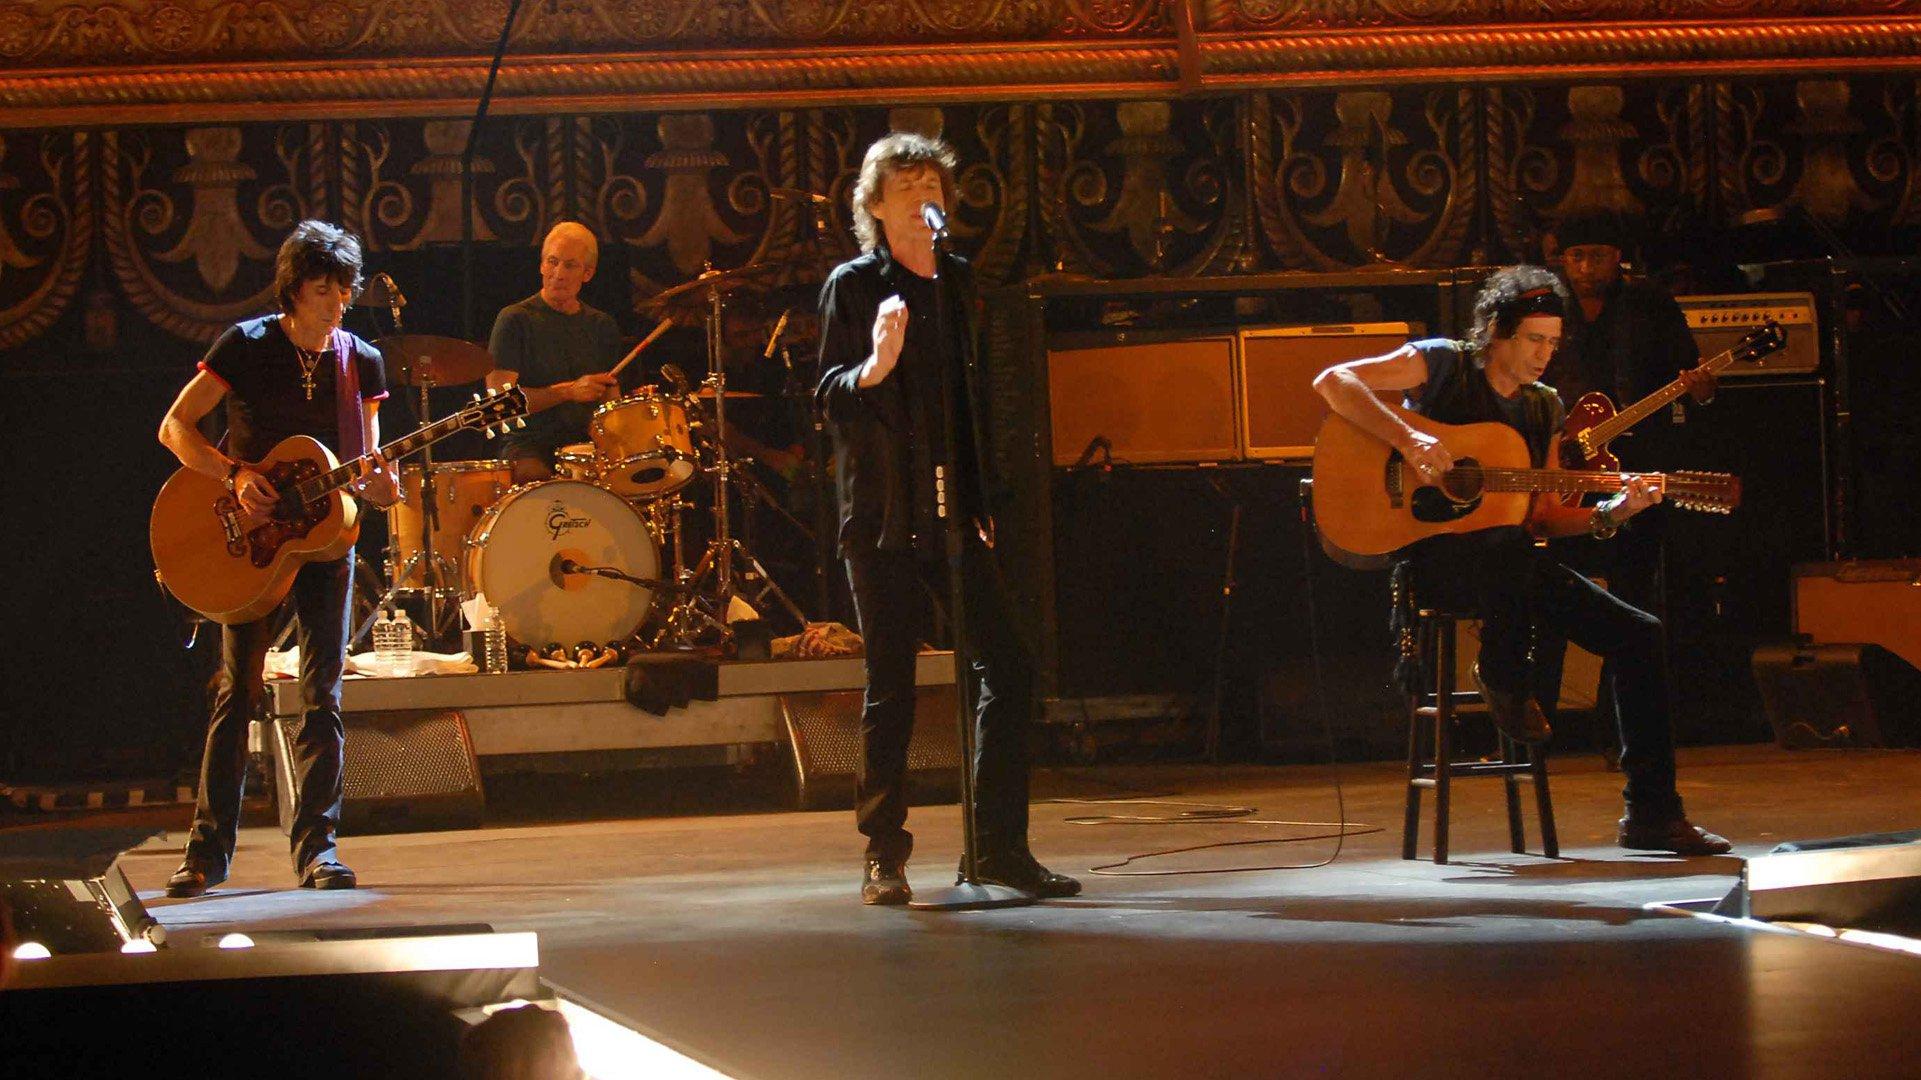 The Rolling Stones. Да будет свет смотреть фото